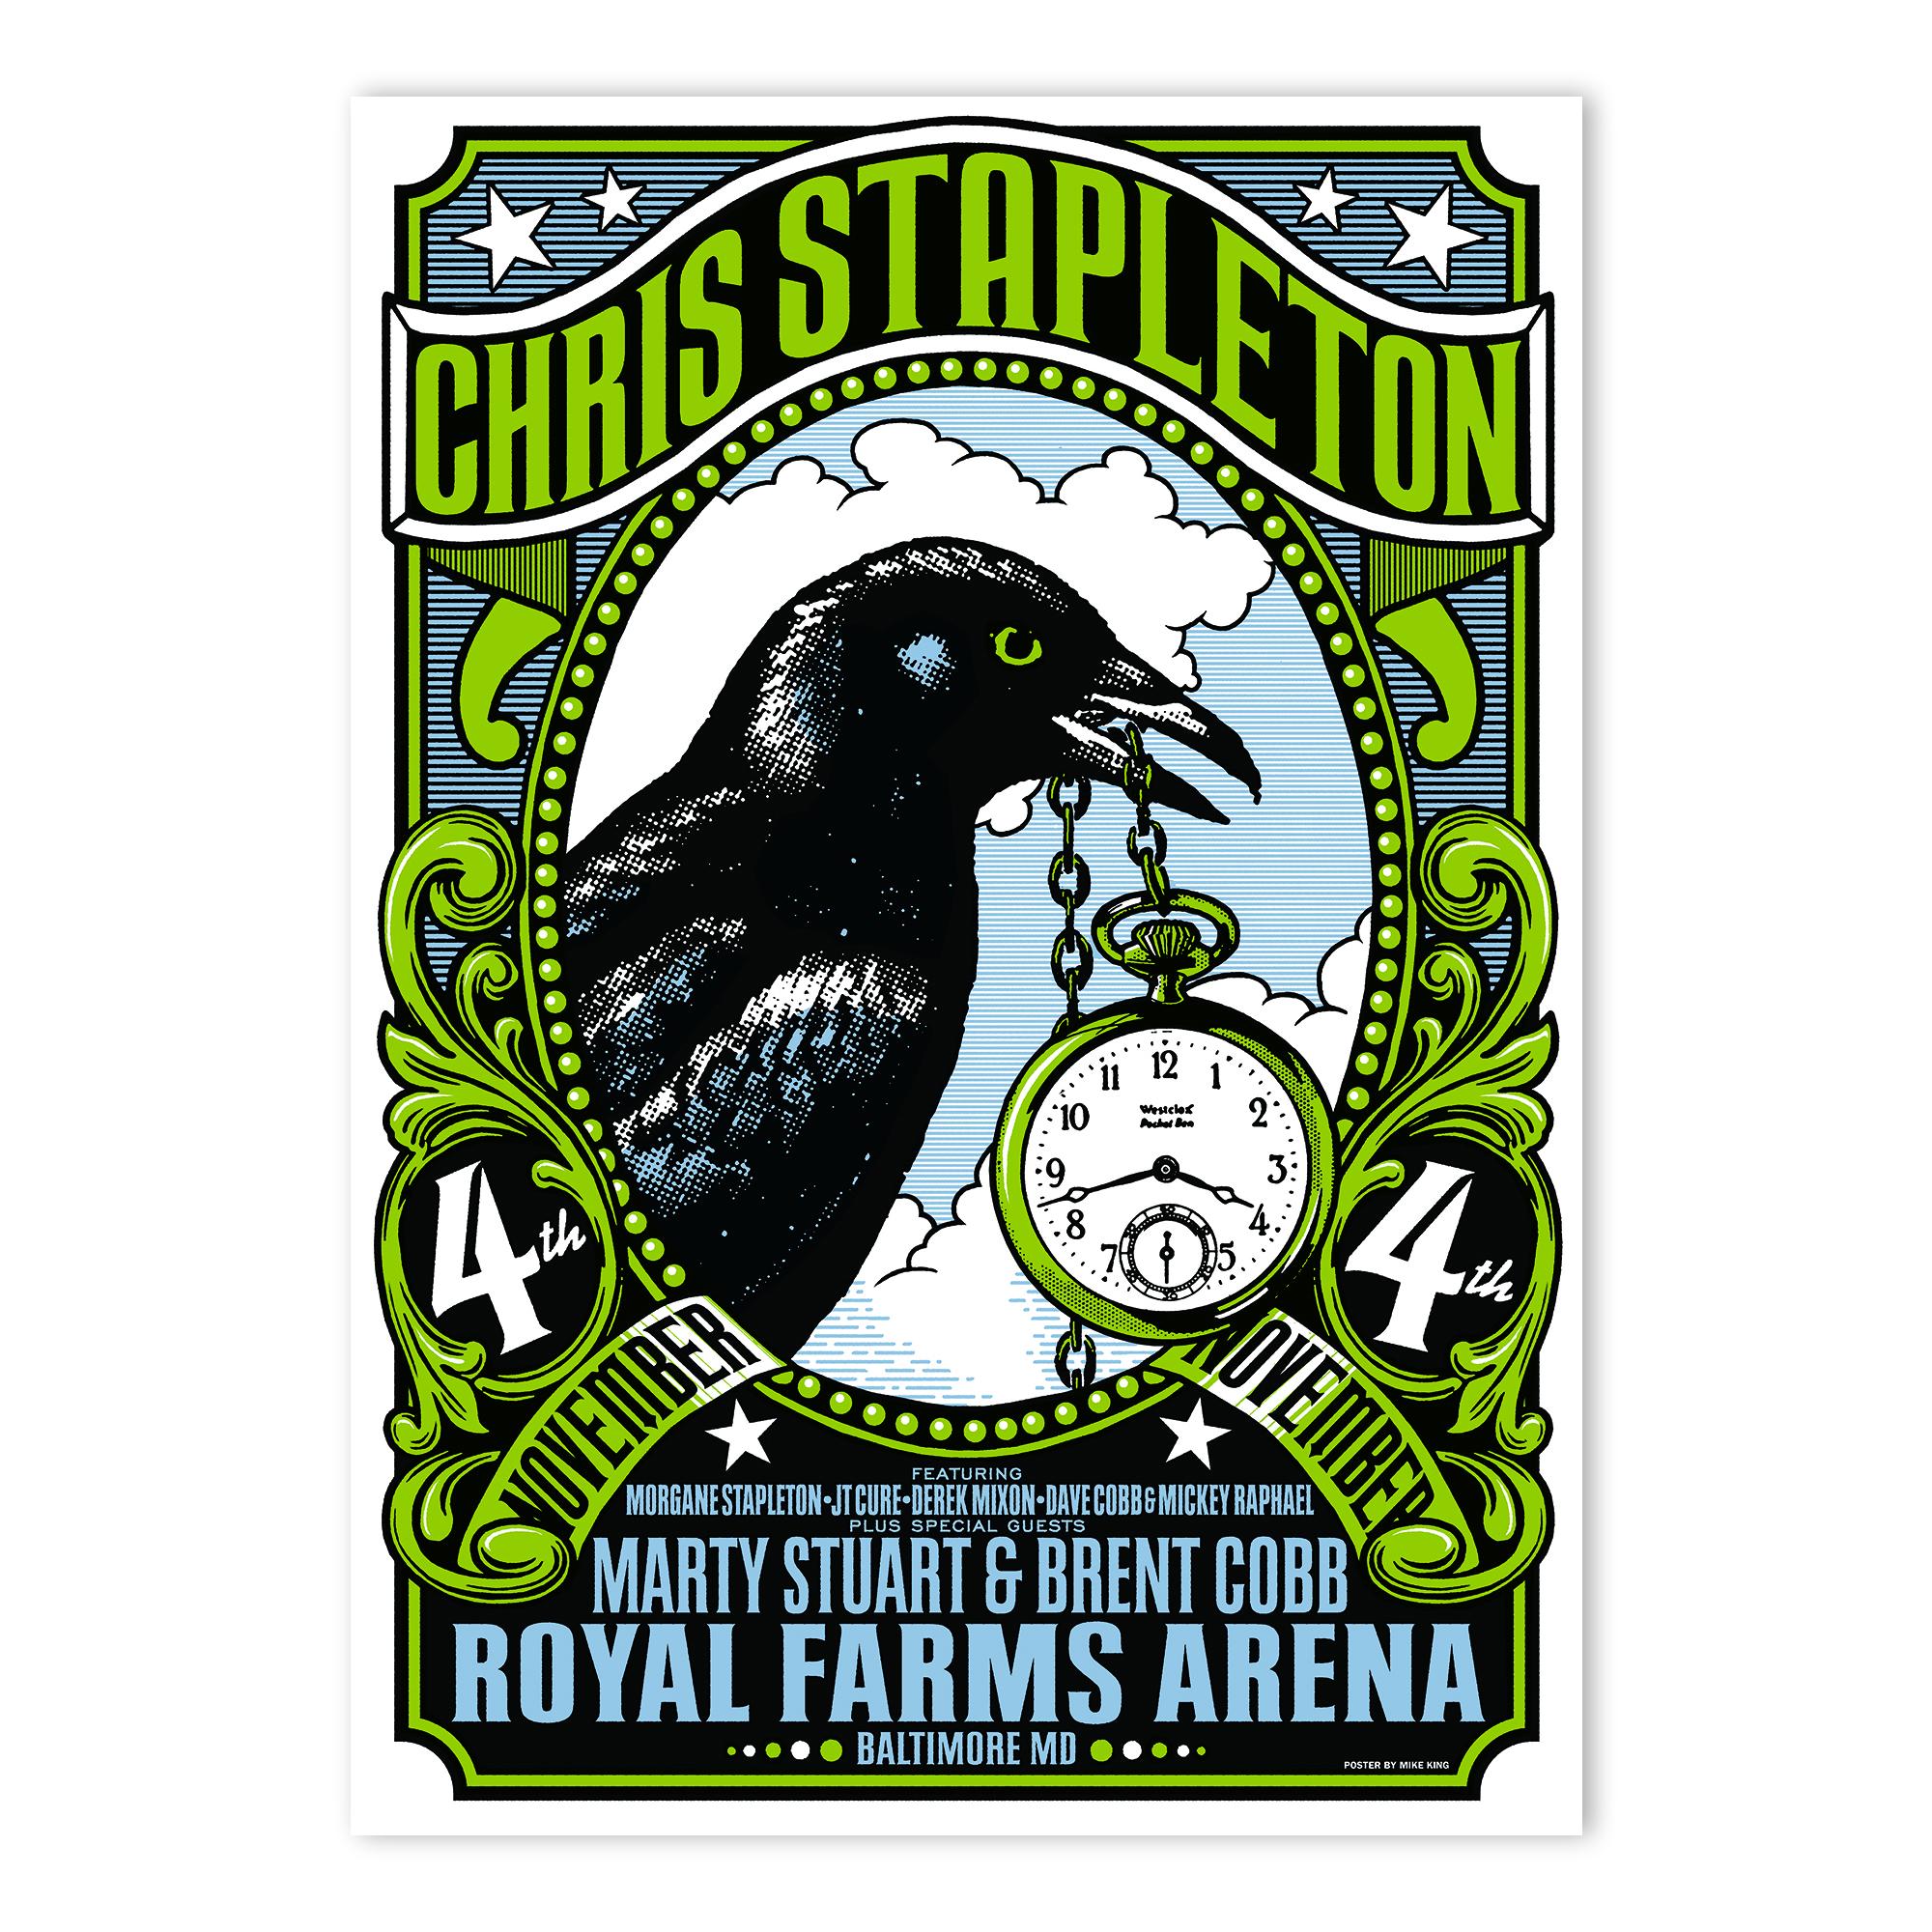 Chris Stapleton Show Poster – Baltimore, MD 11/4/18